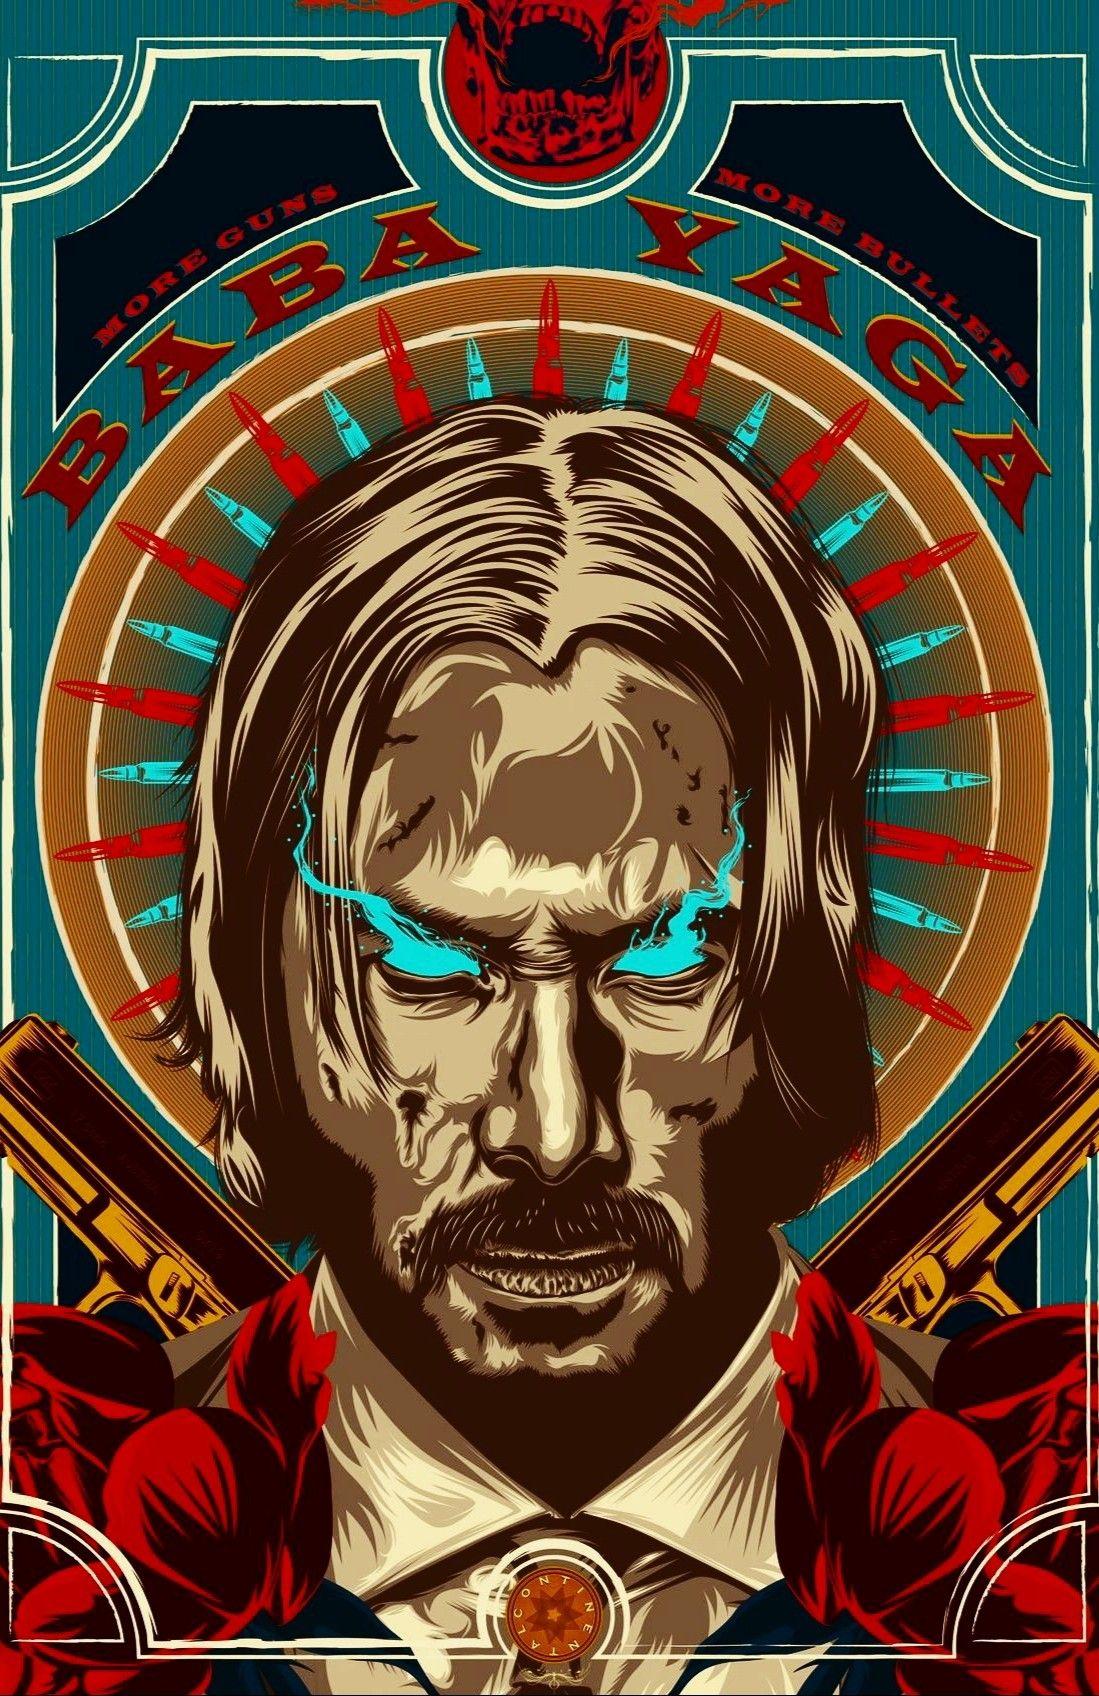 Keanu Reeves Aka John Wick 3 Parabellum Pop Art Posters